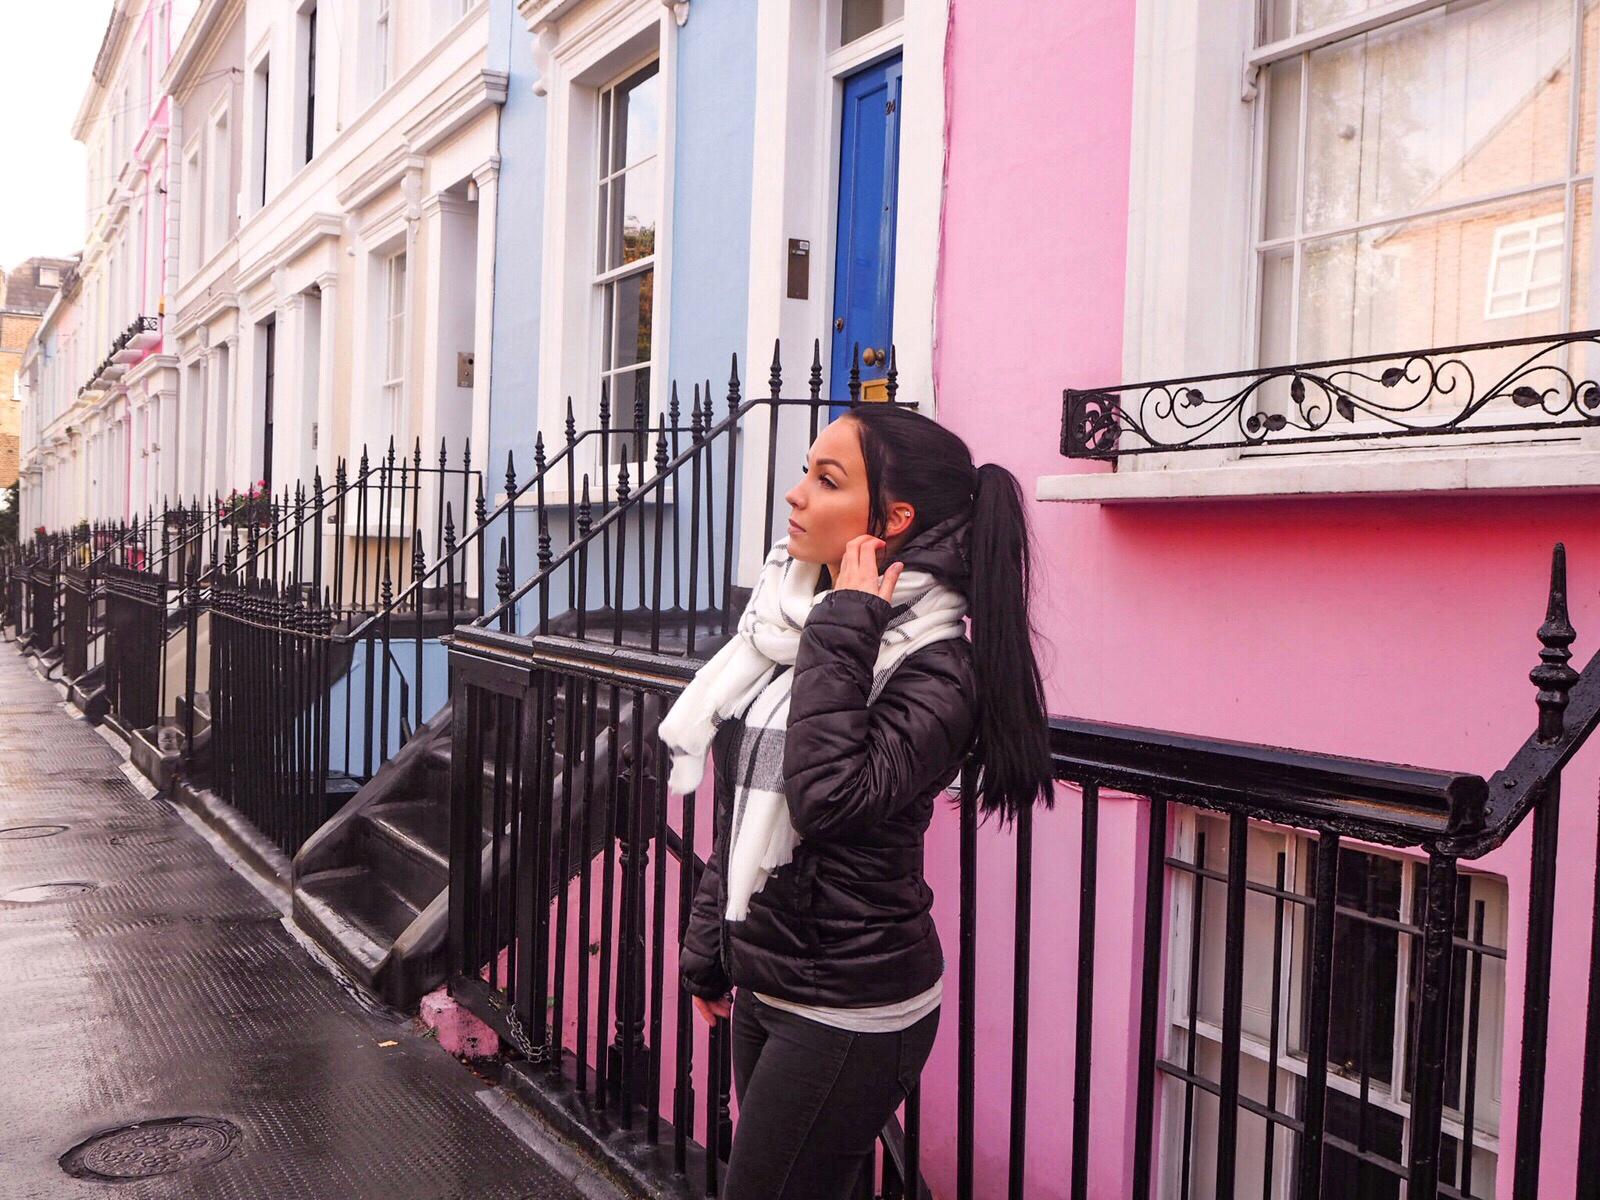 Notting Hill kuvauspaikat